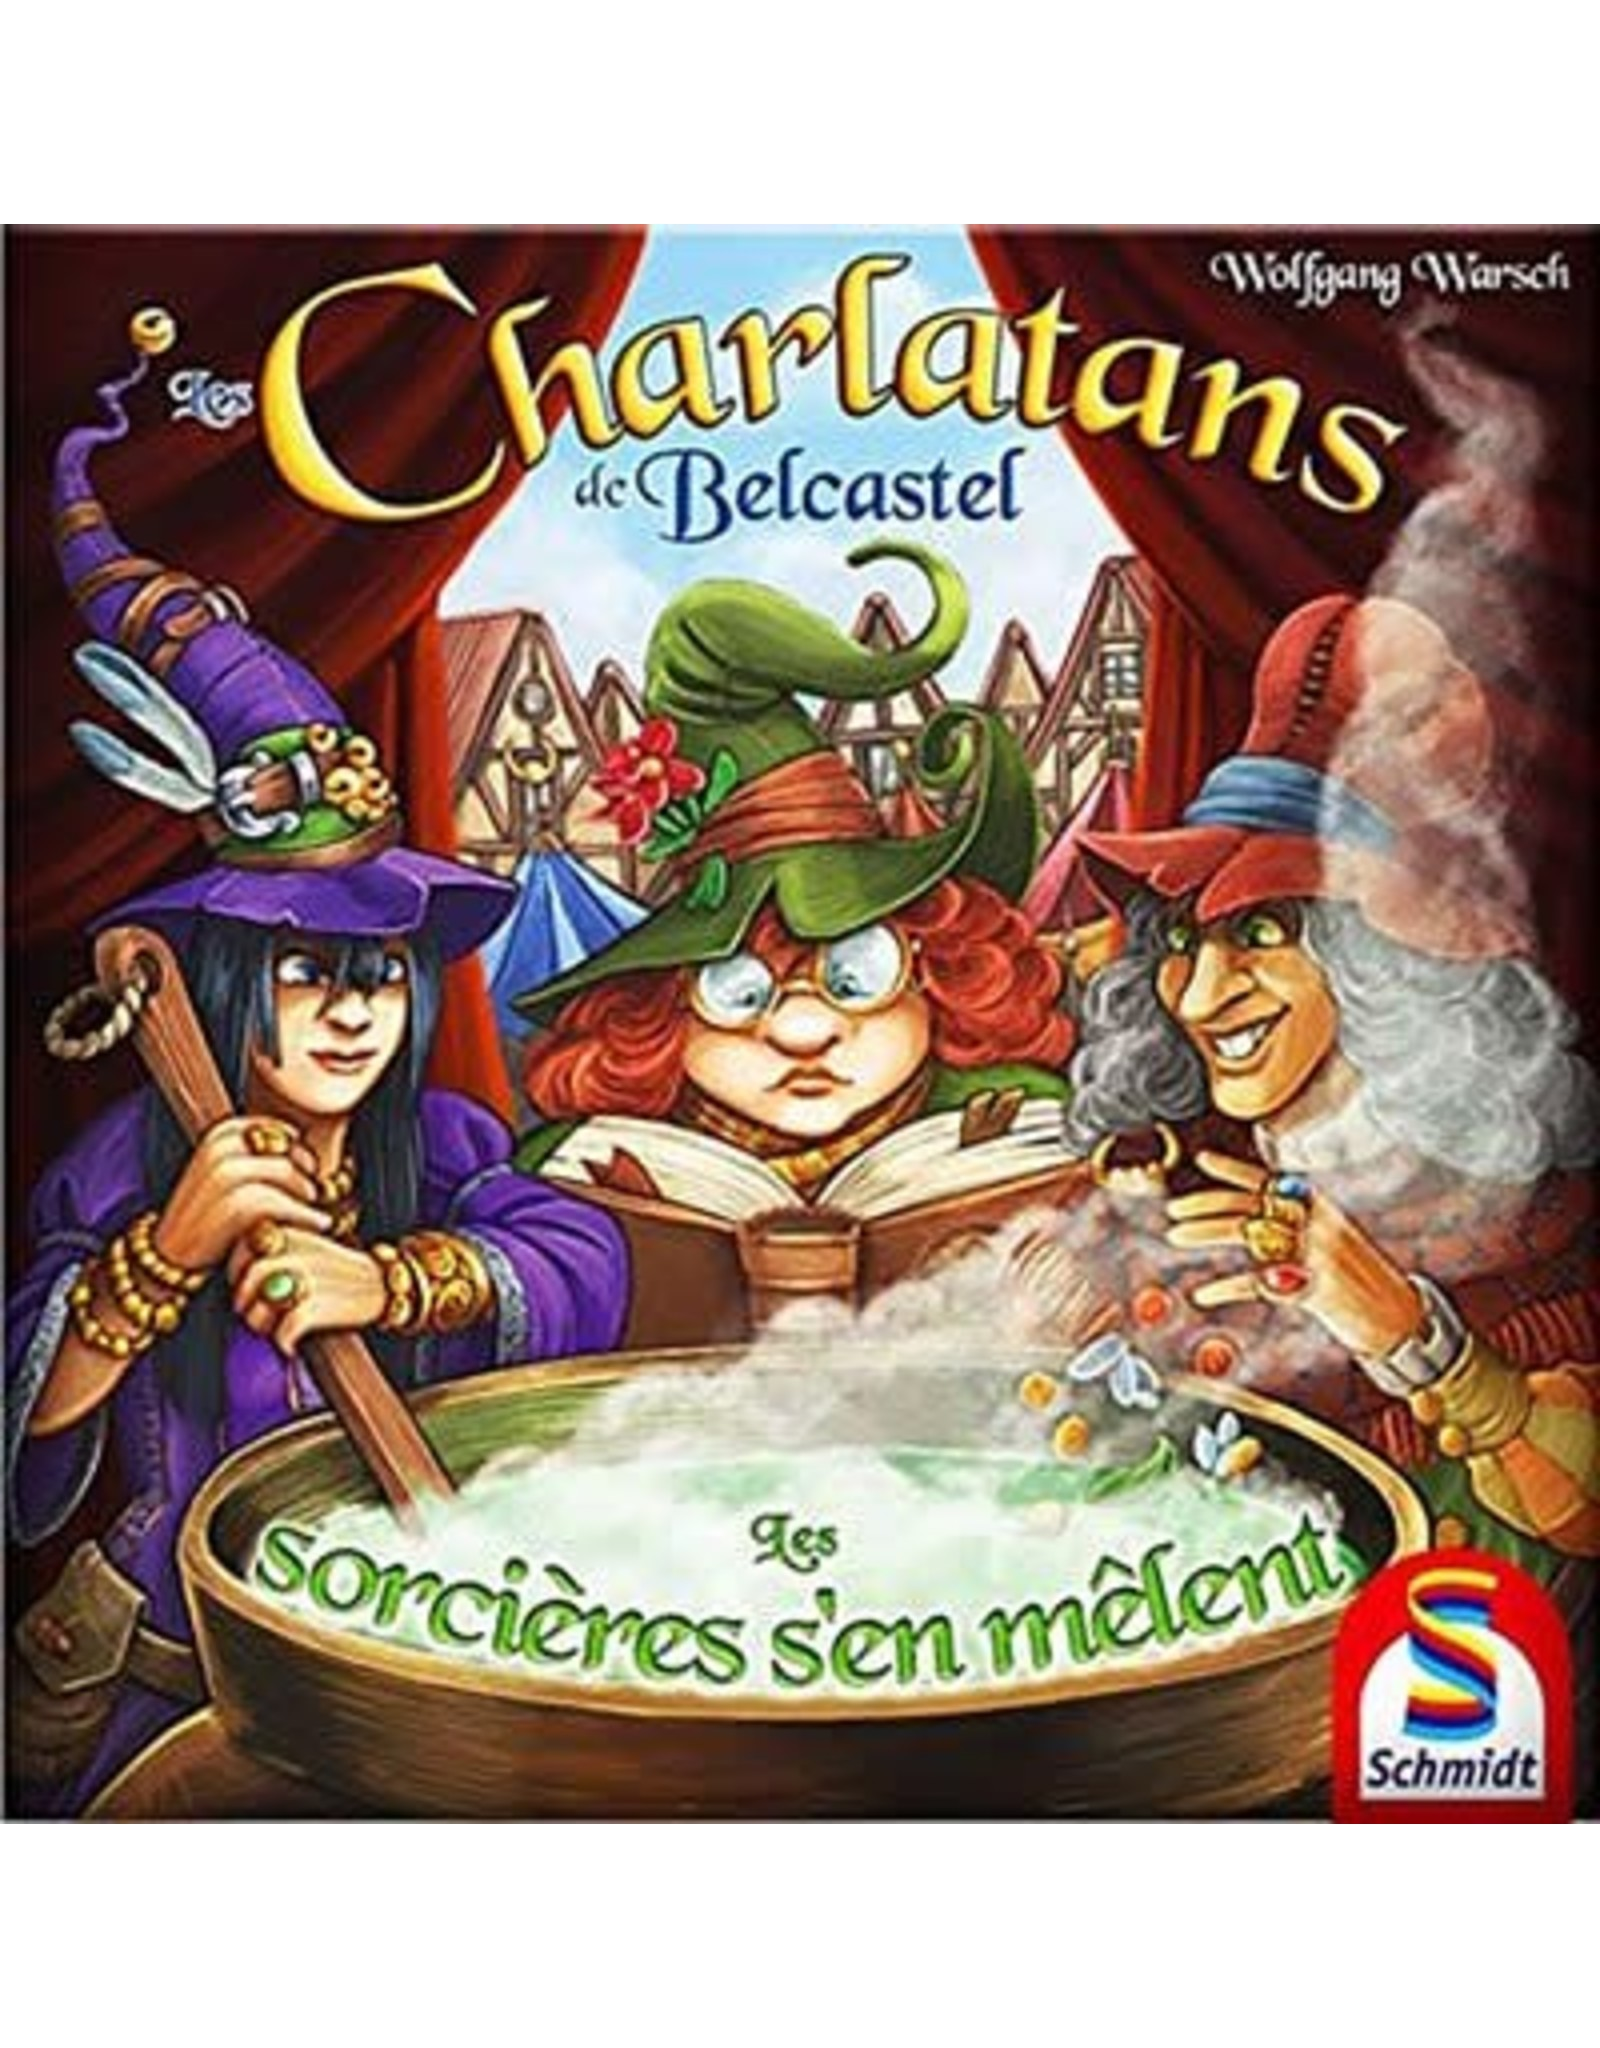 Schmidt Les Charlatans de Belcastel: Les Sorcieres s'en Melent